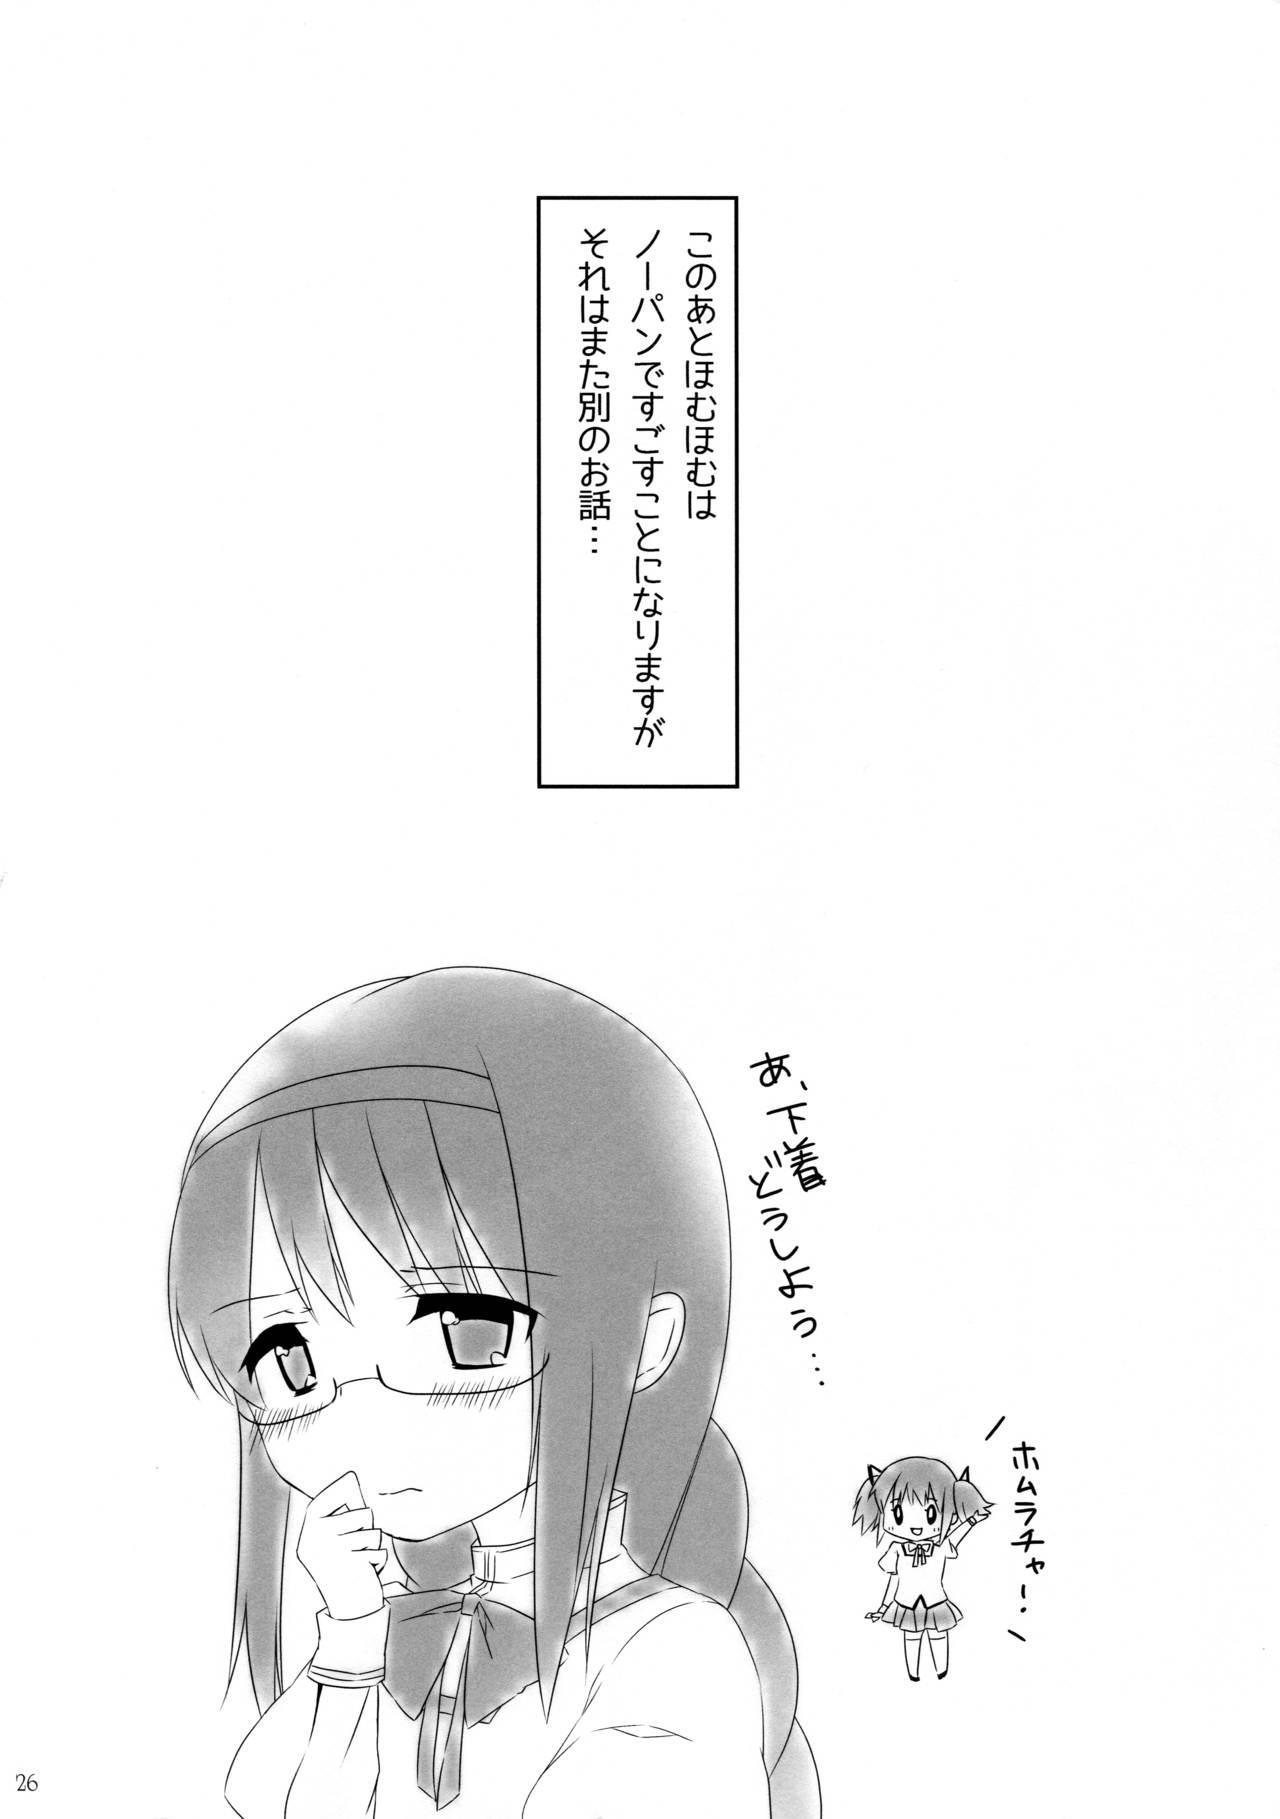 Otome Koichigo - a sweetest strawberry 26